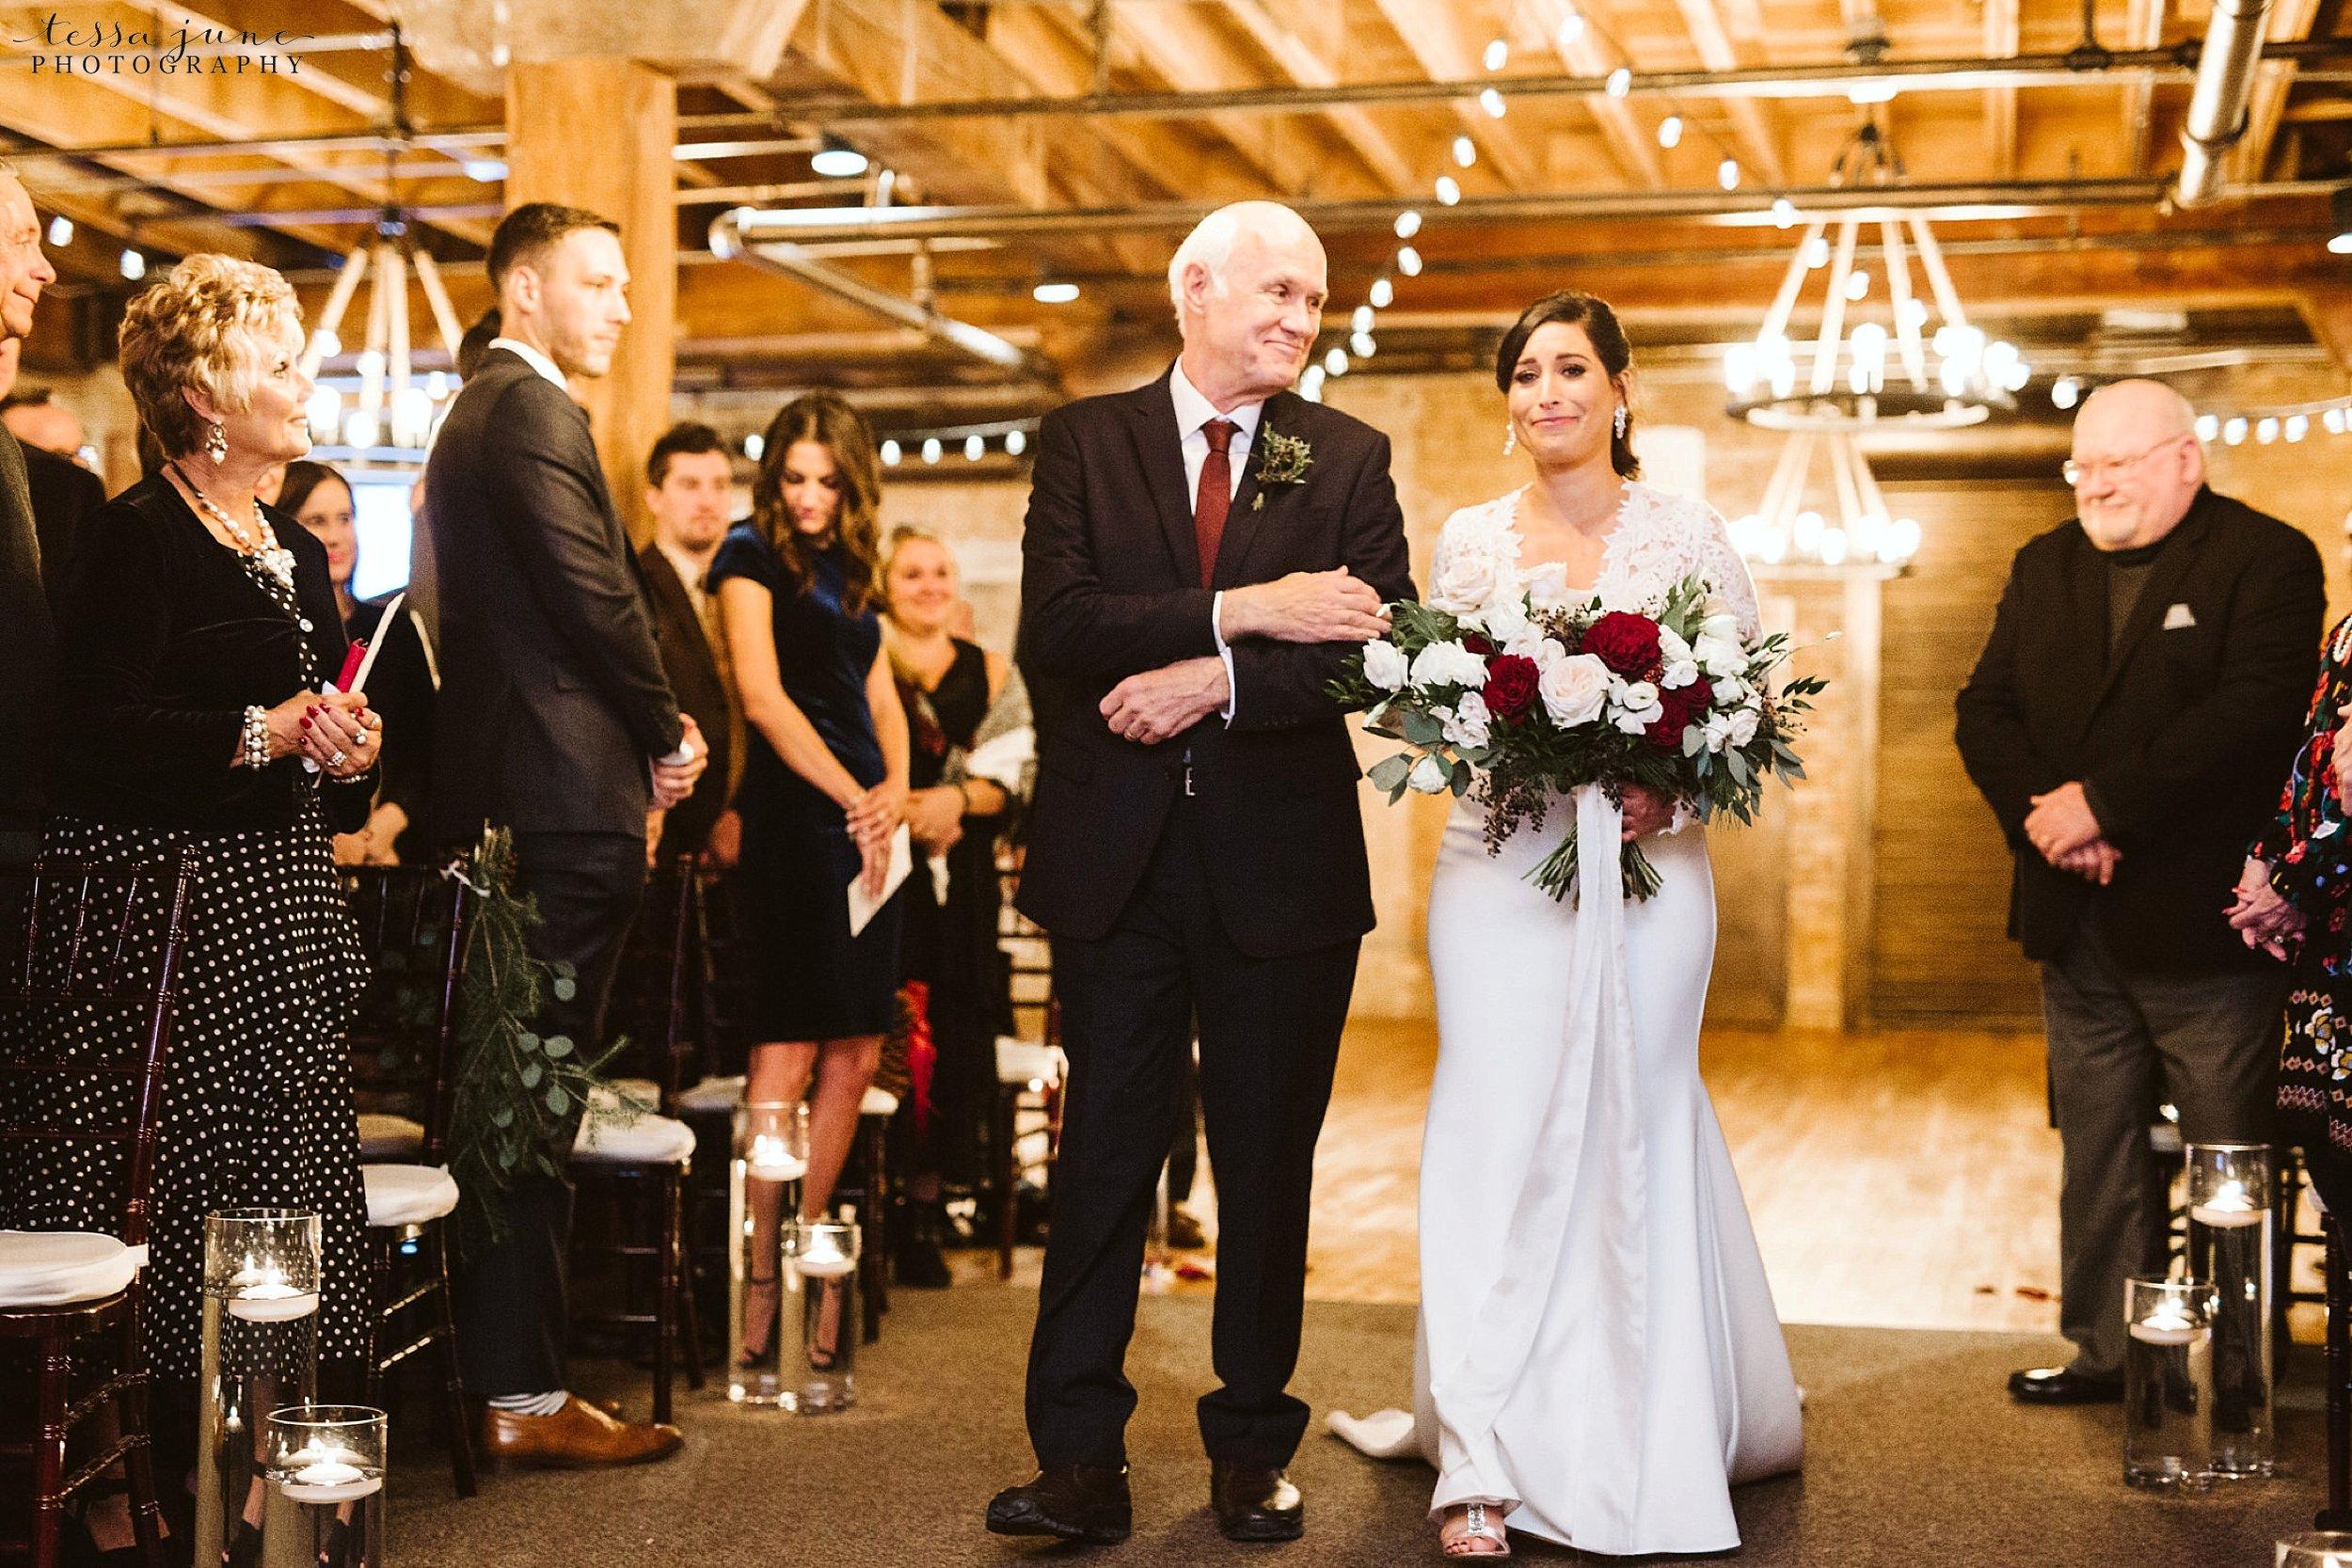 minneapolis-event-center-winter-romantic-snow-wedding-december-143.jpg